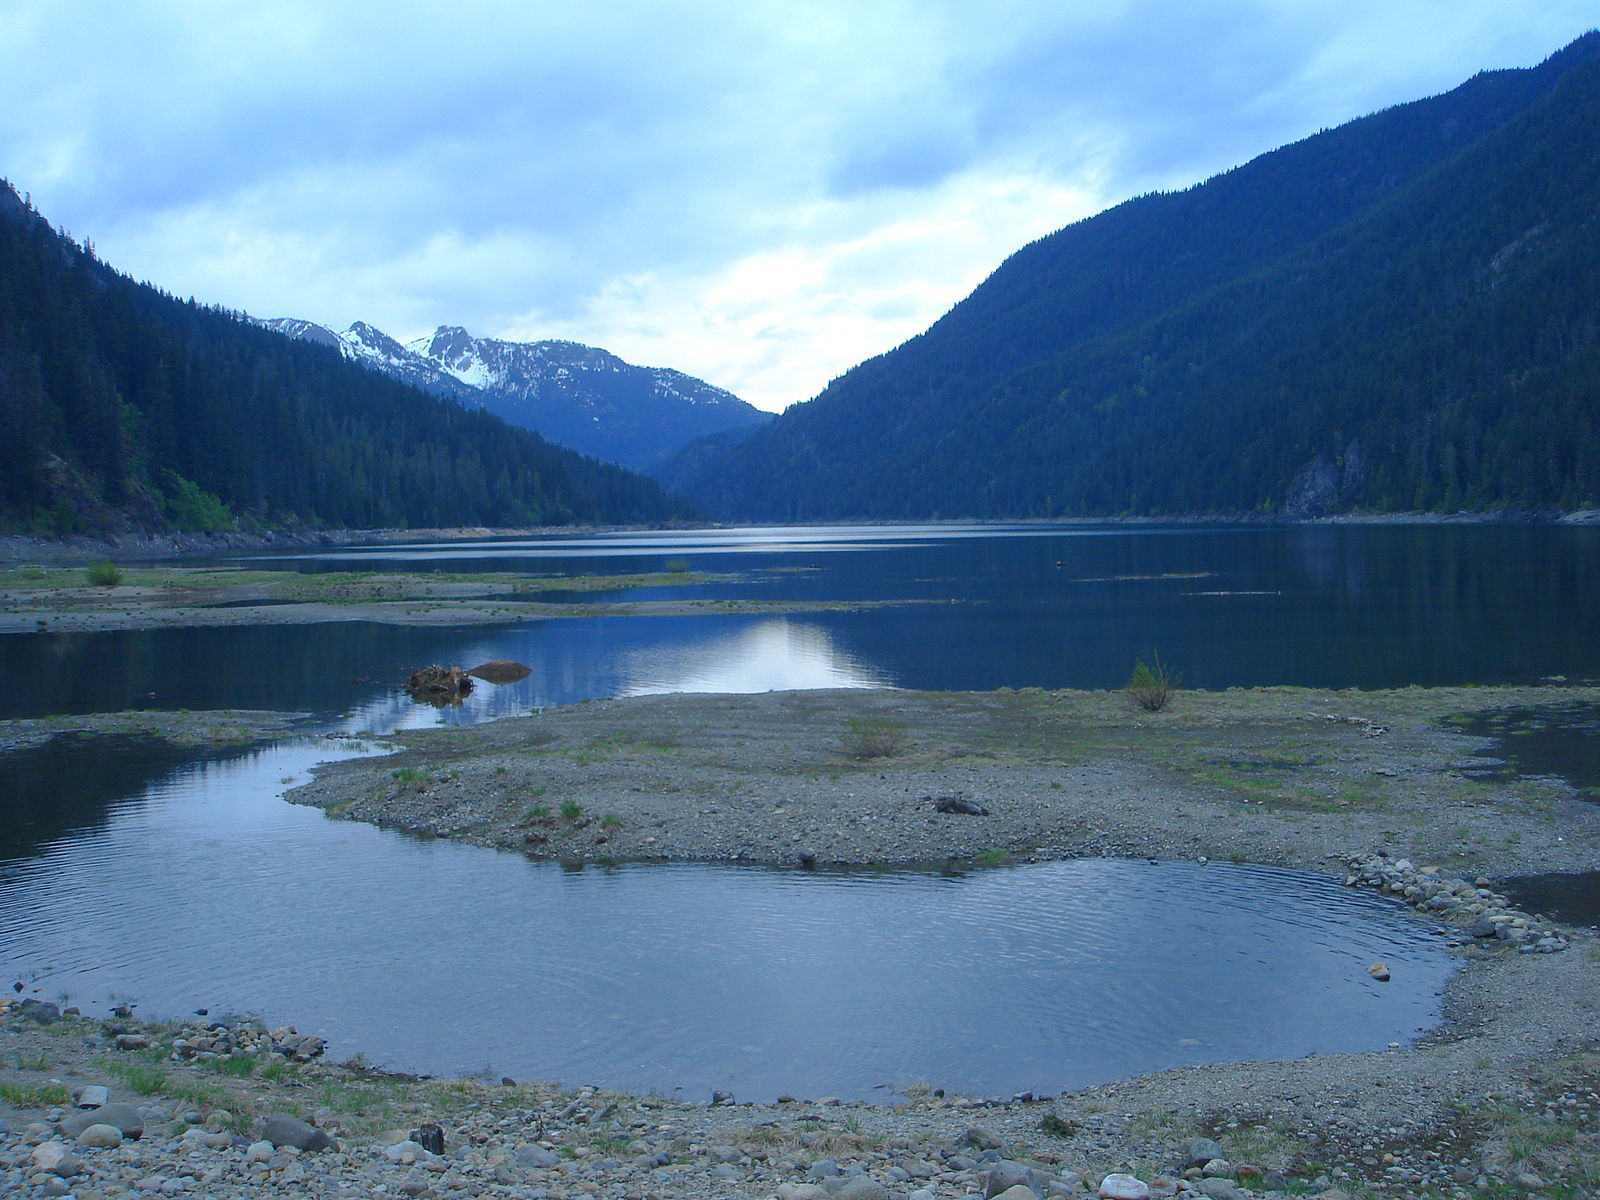 Kachess Lake, Washington